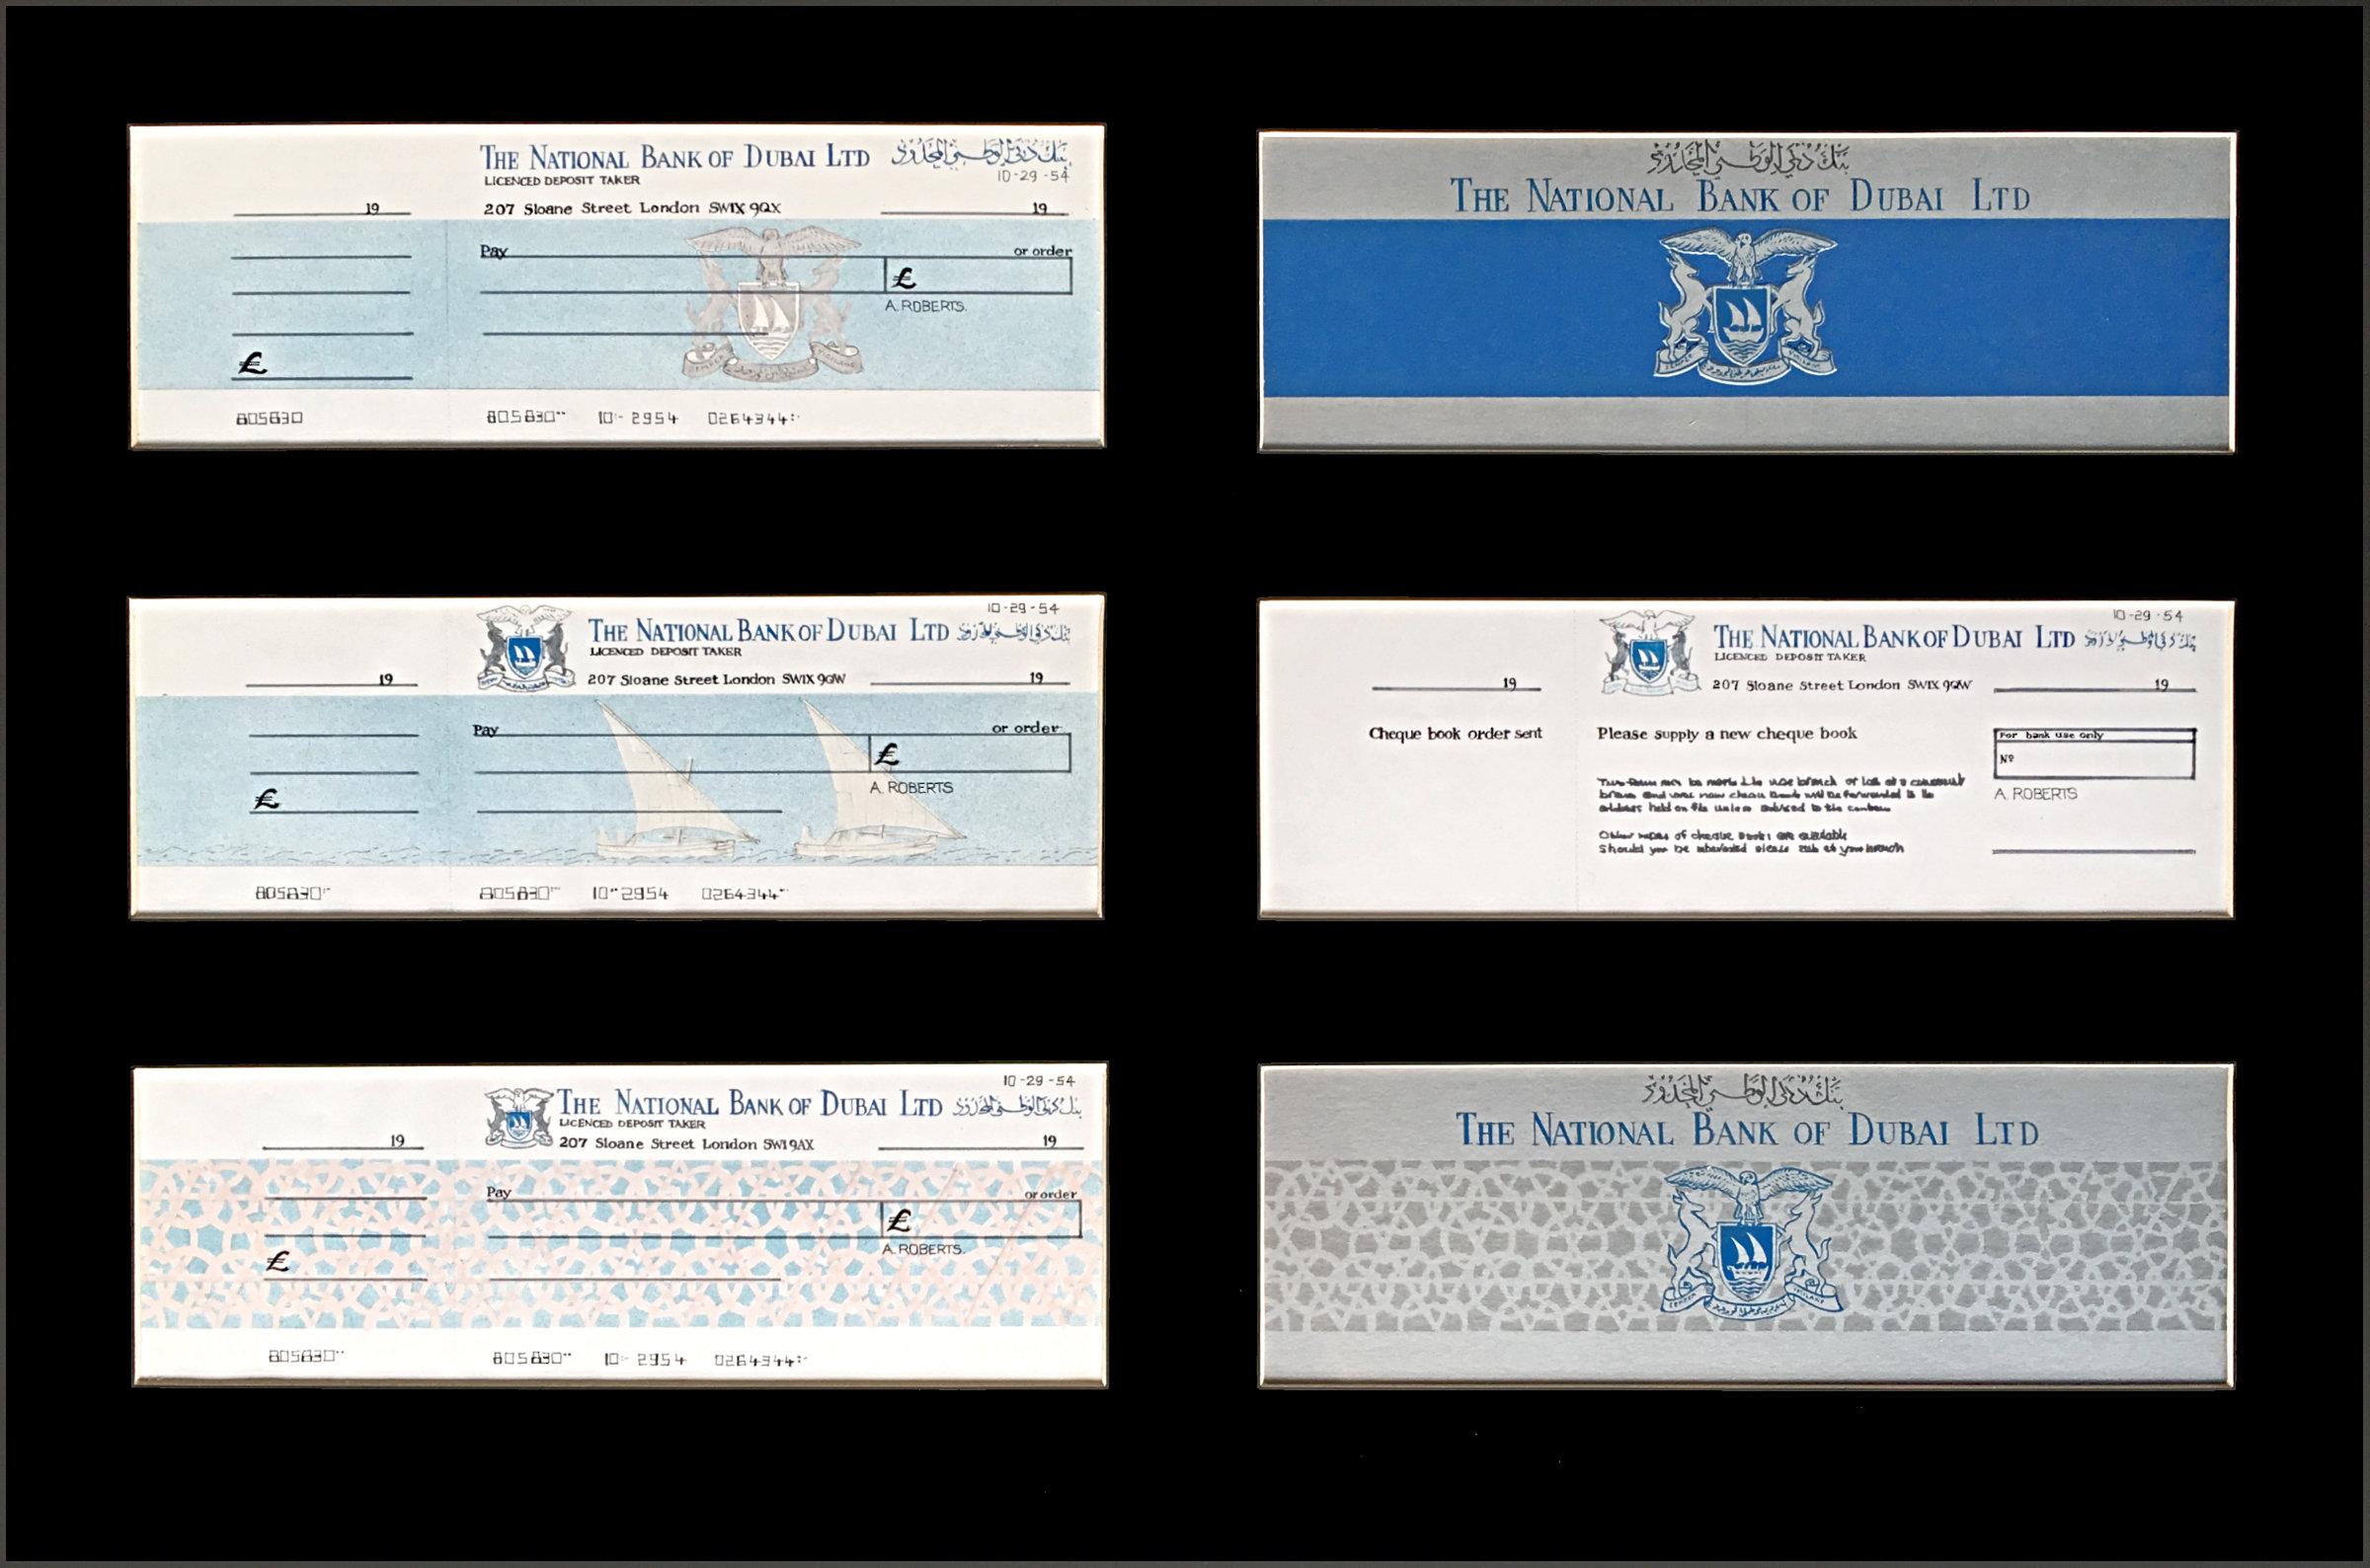 Dubai cheque book designs.jpg